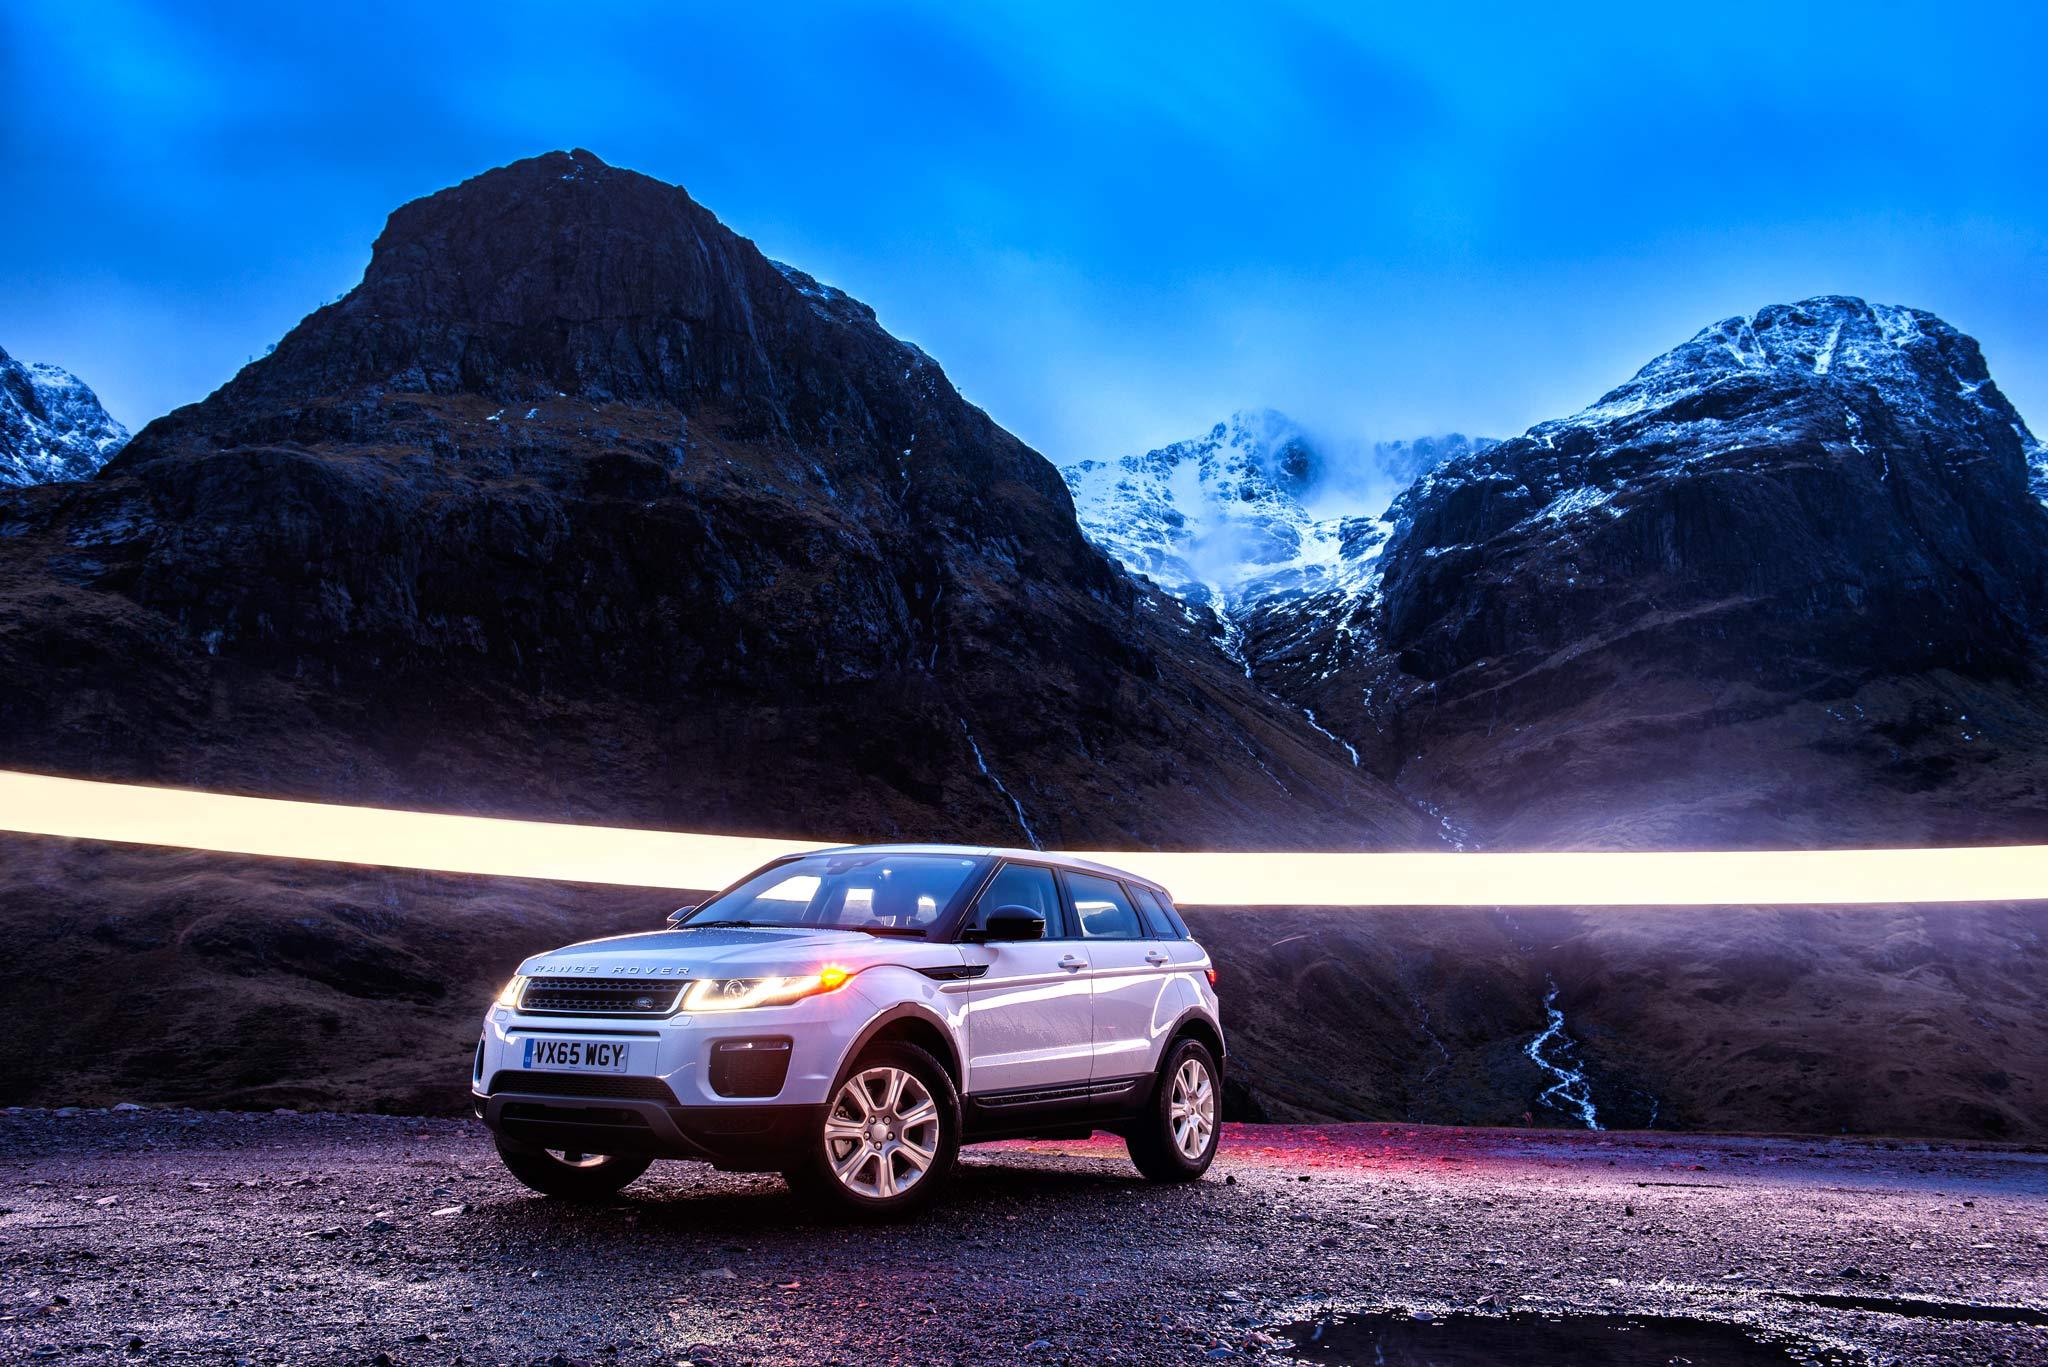 Land Rover Evoque - Glencoe. Image © Dean Wright Photography